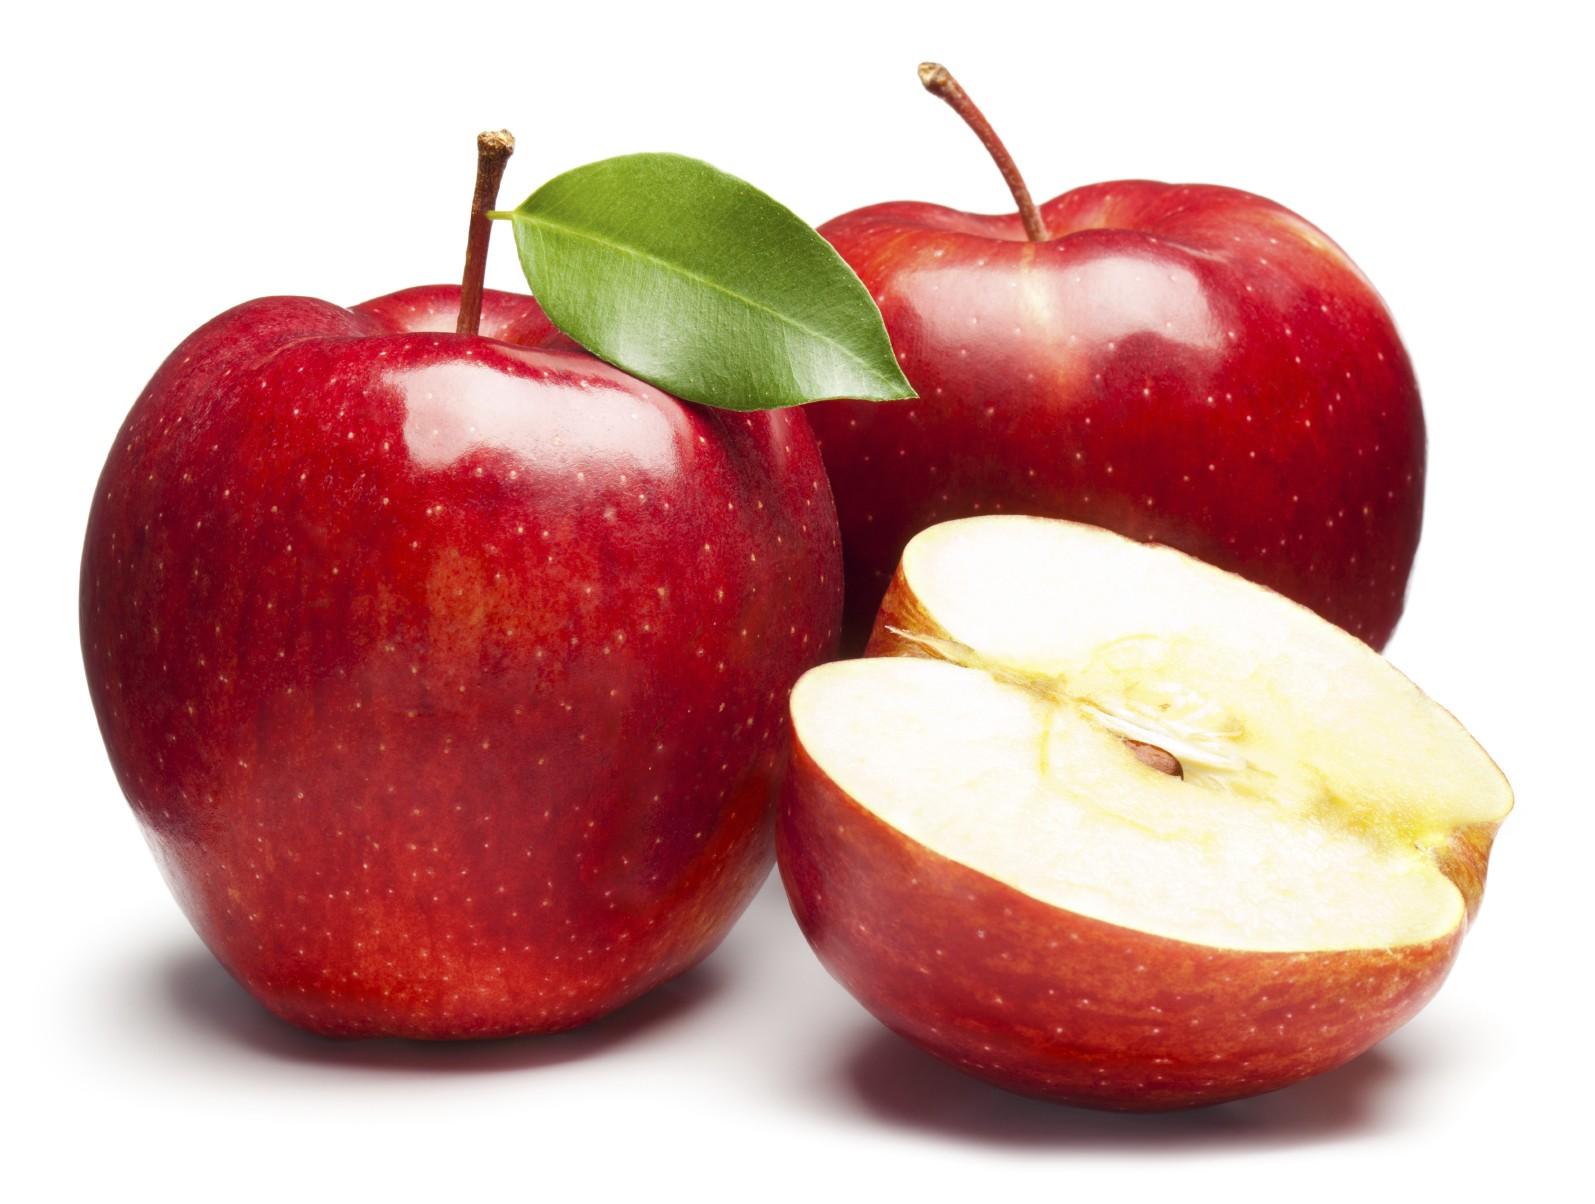 apples-prostate-cancer-curing-foods